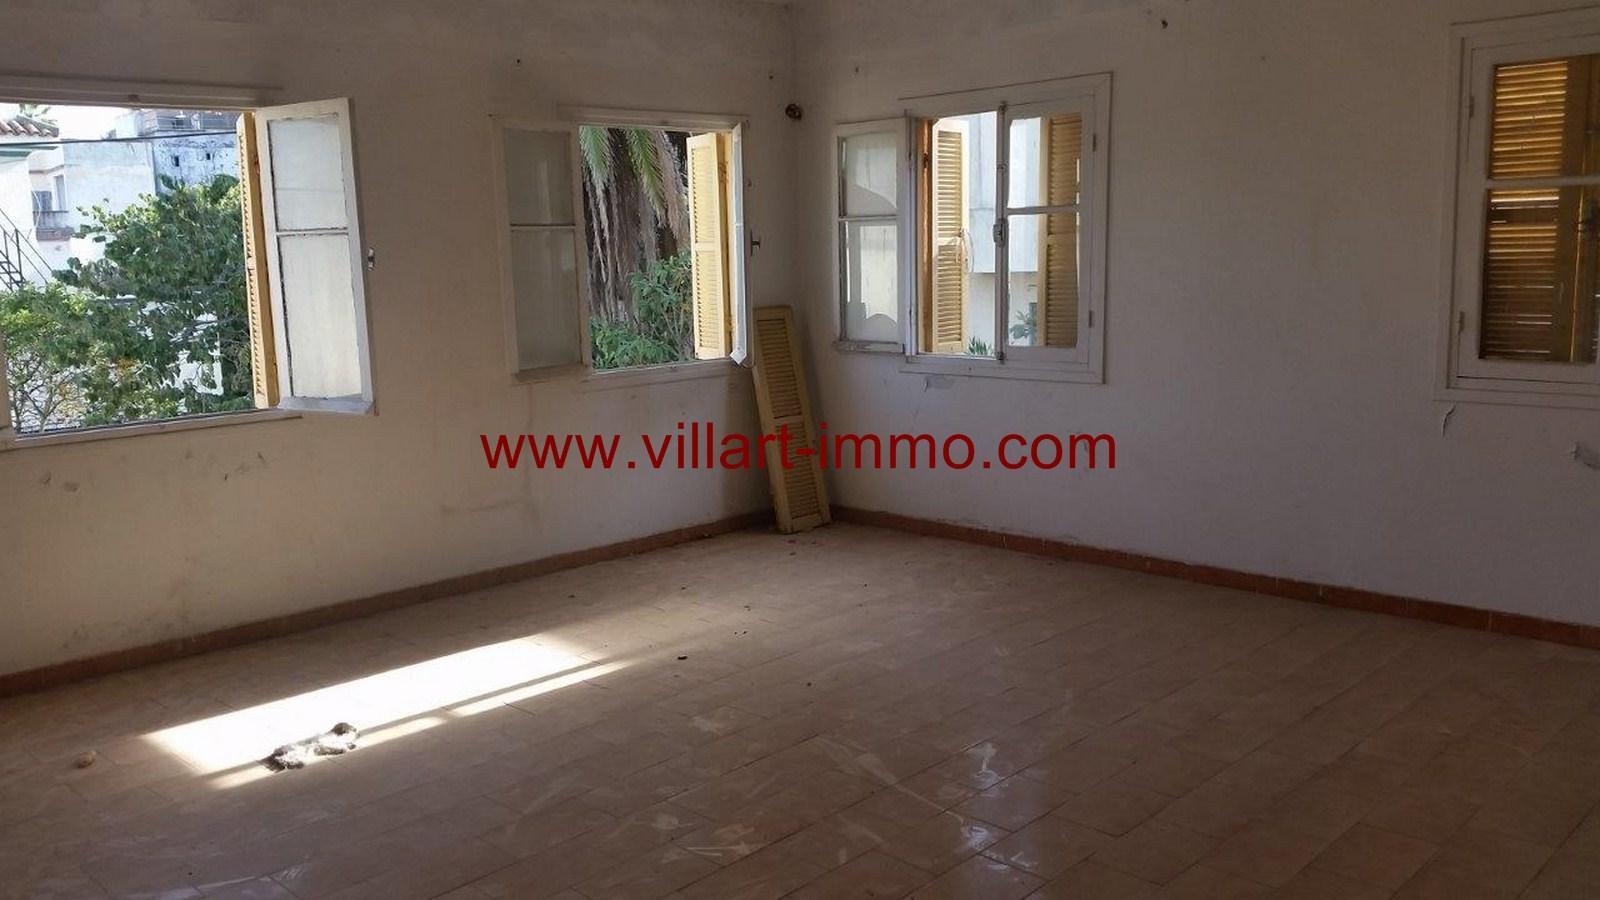 12-vente-maison-tanger-marchan-salon-4-vm381-villart-immo